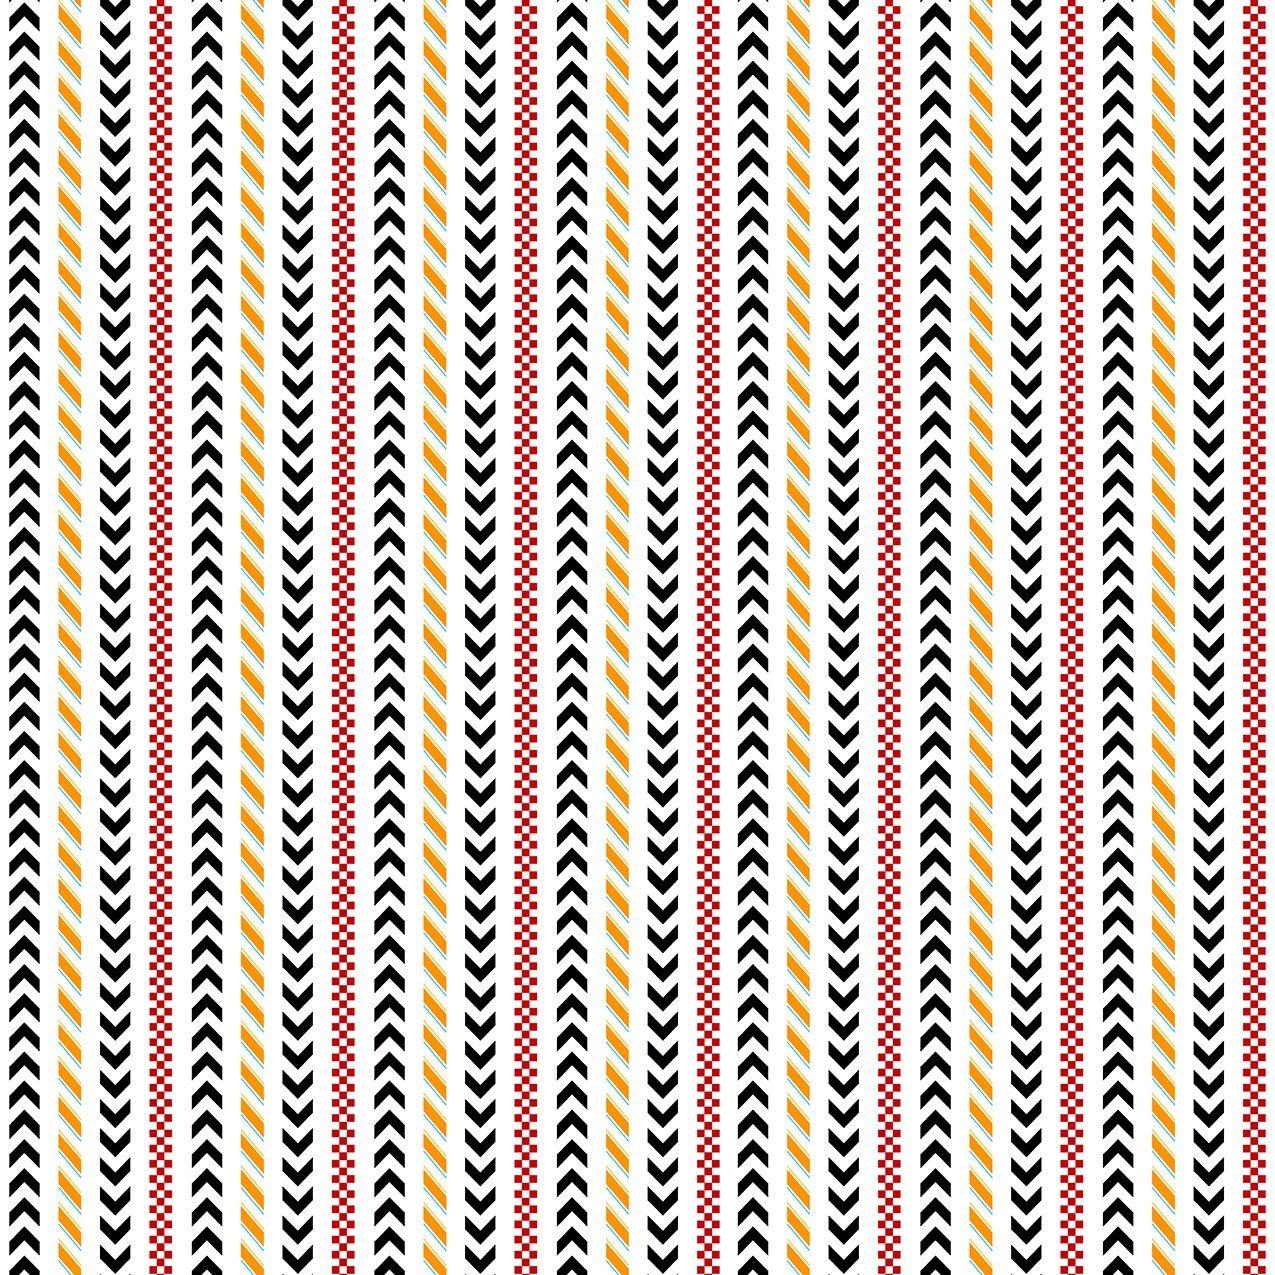 WILM- Race Day Stripe White